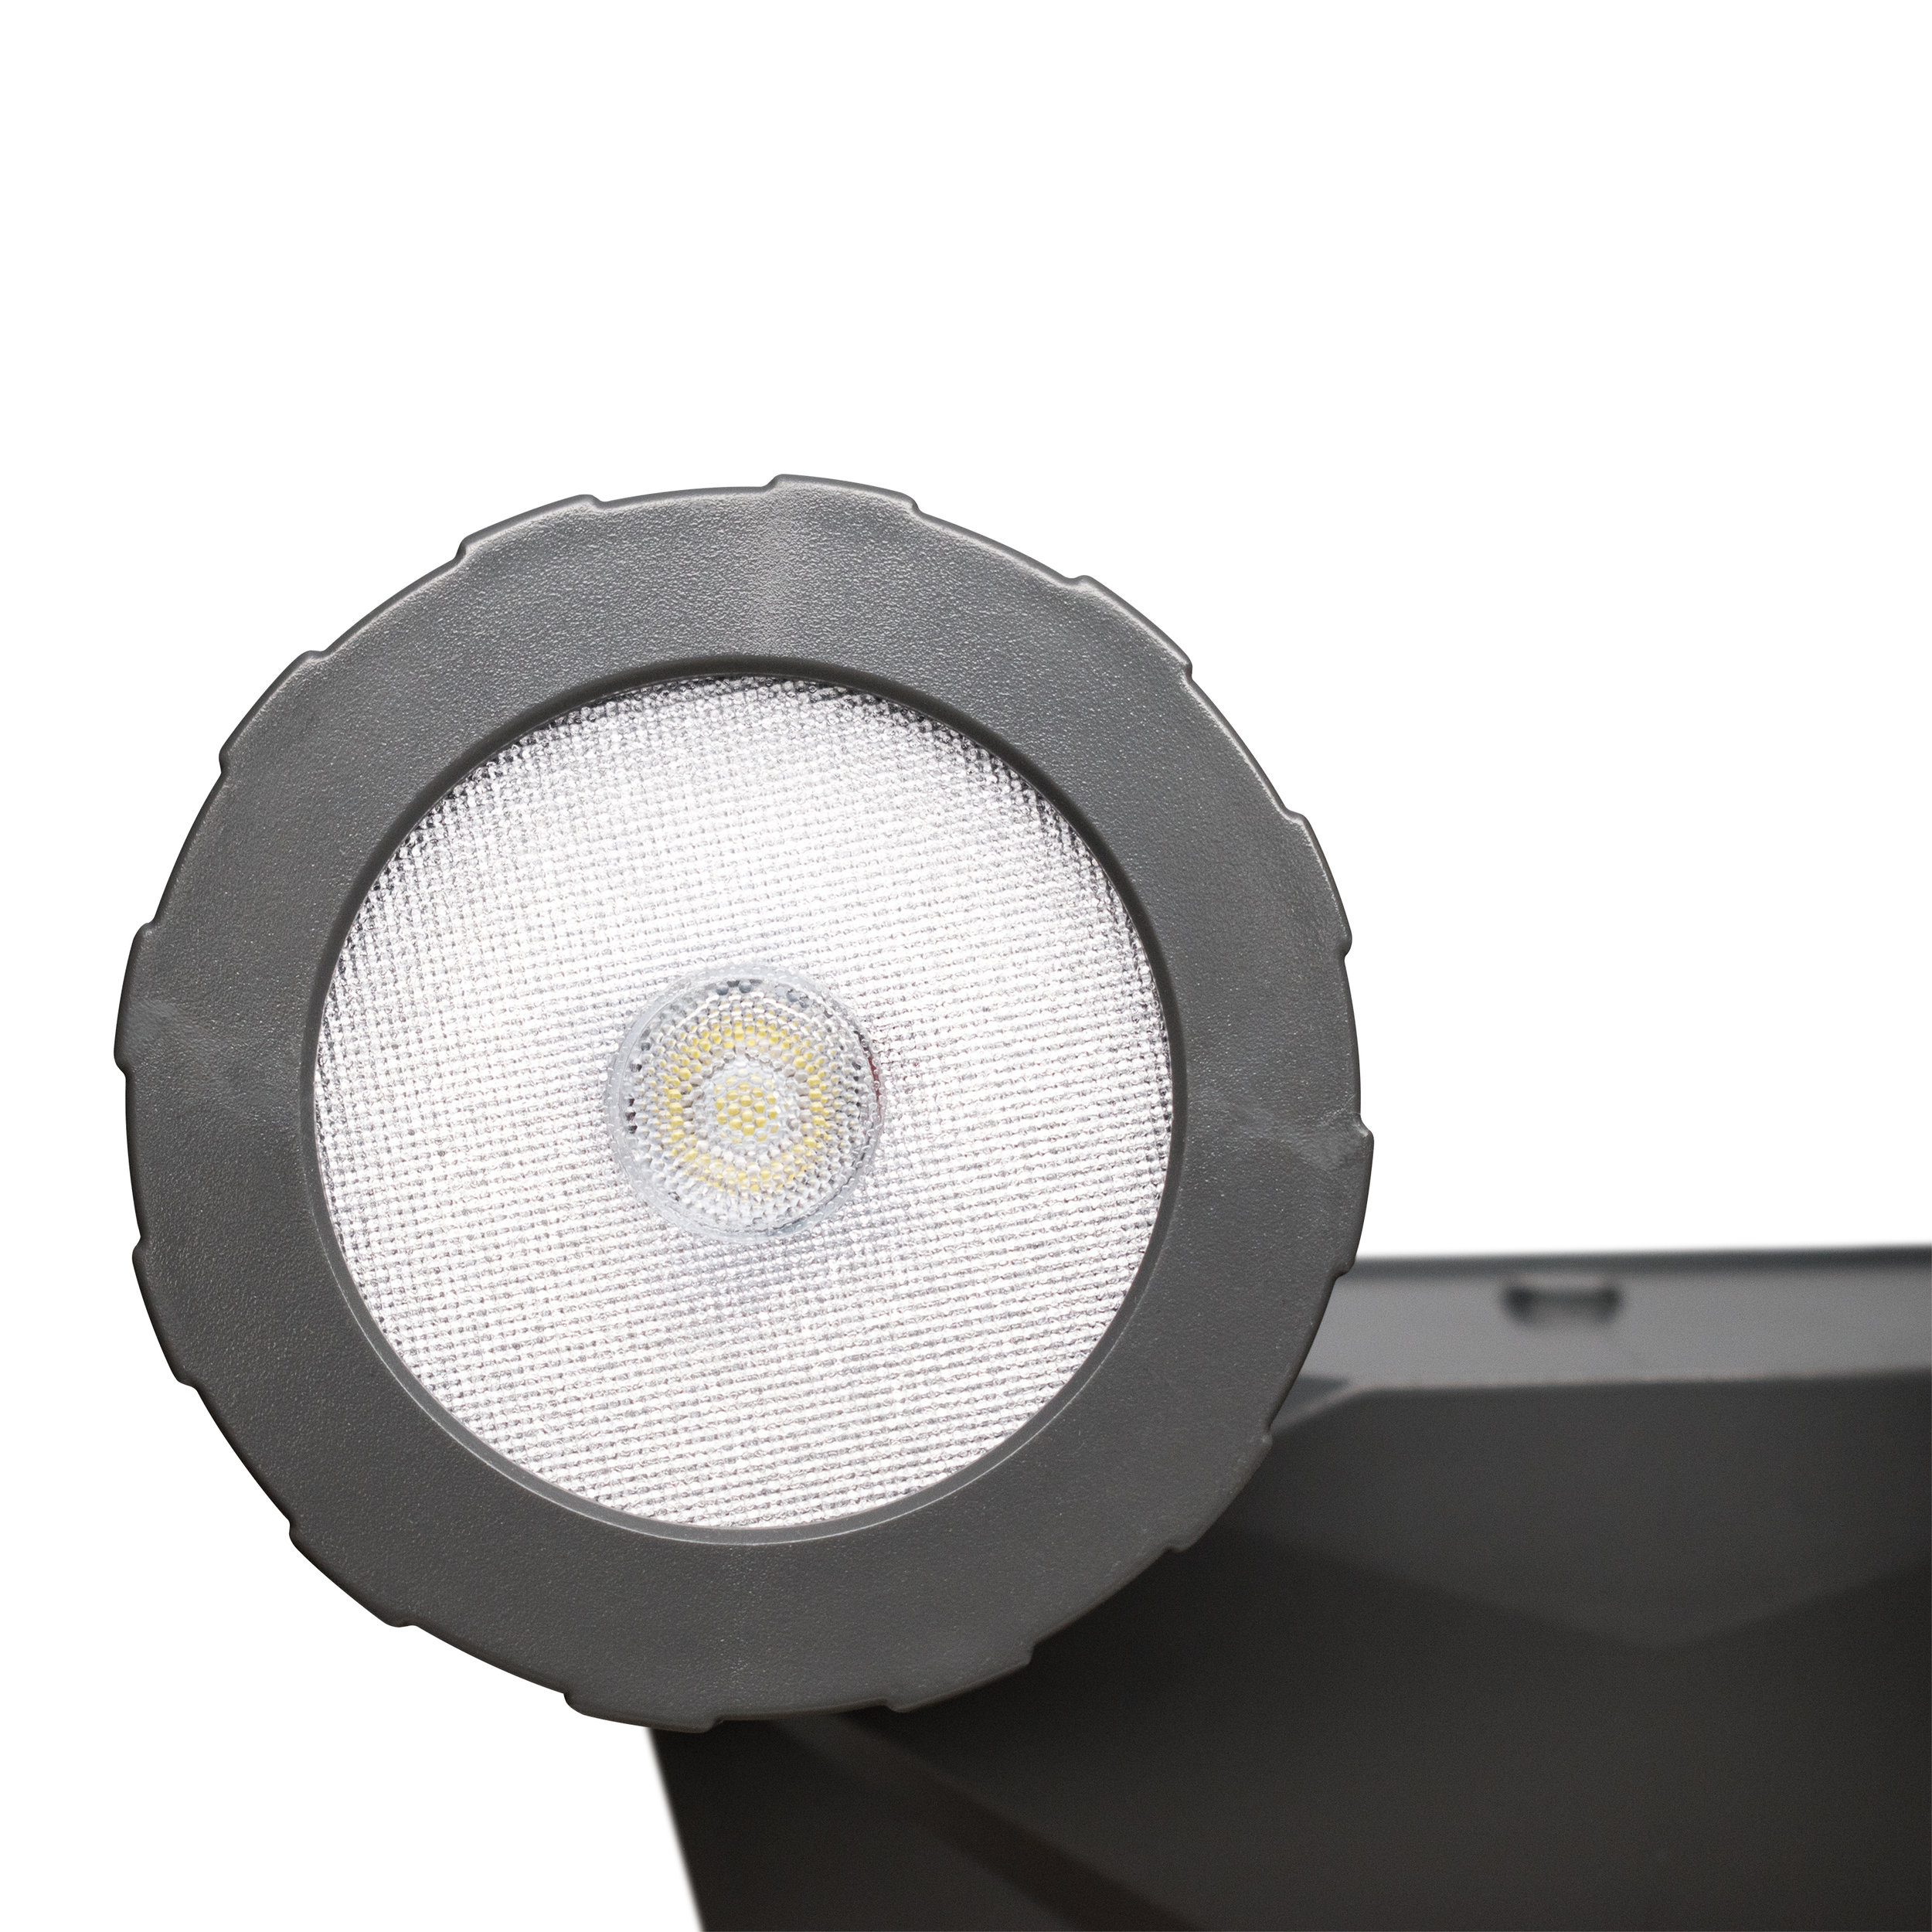 NL-DSG2 Solar Security Light, Lamp Head Detail